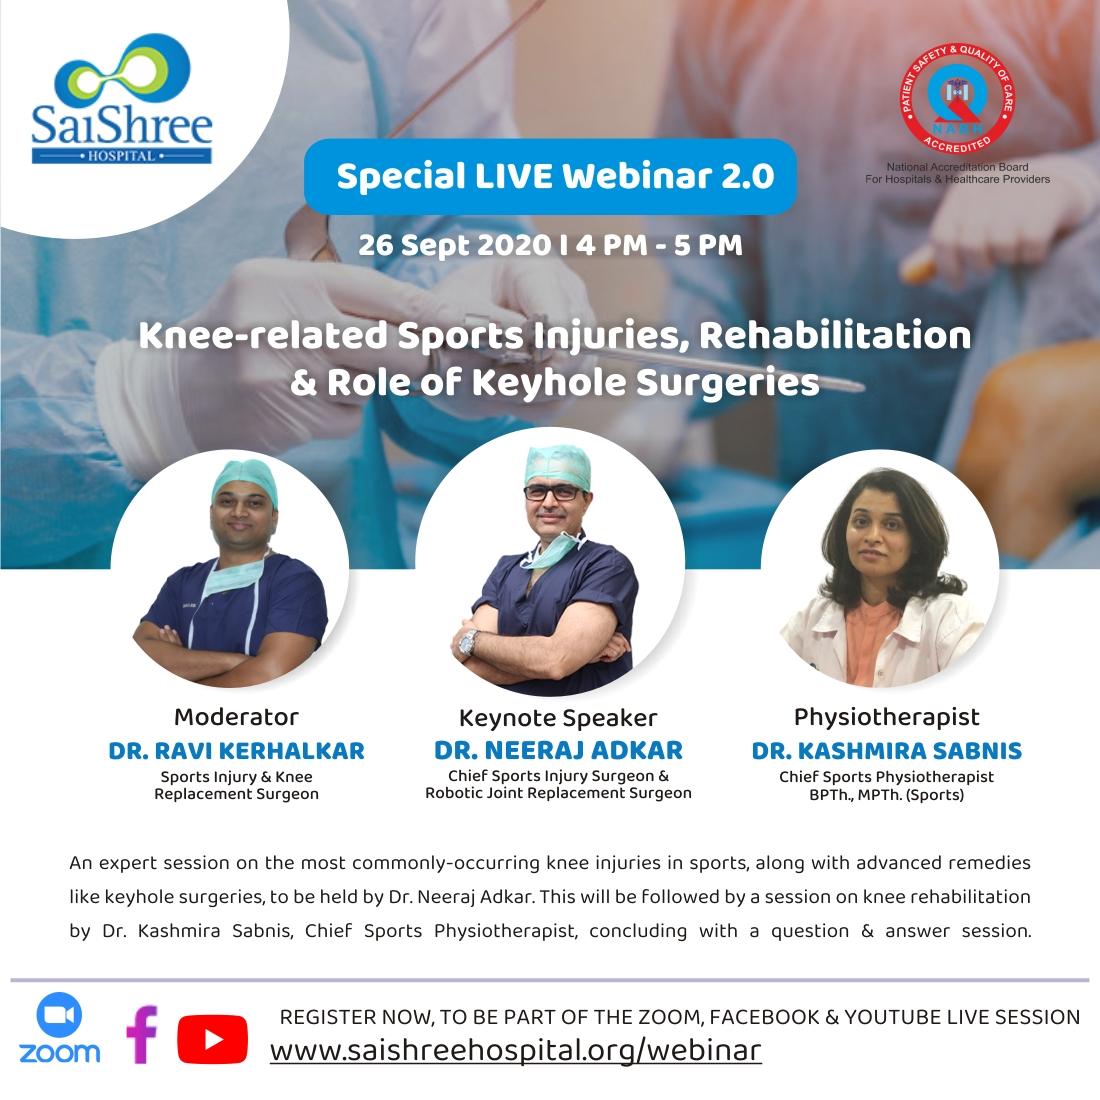 Webinar 2.0 Alert - Knee related Sports Injuries, Rehabilitation and Role of Keyhole Surgeries. To register - https://t.co/FSEg6J387p  #webinar #SaishreeHospital #healthcare #sportsinjuries #keyholesurgery #robotics #pune #aundh #mumbai #kolhapur #sangli #satara #jalna https://t.co/QcXsWYOj02